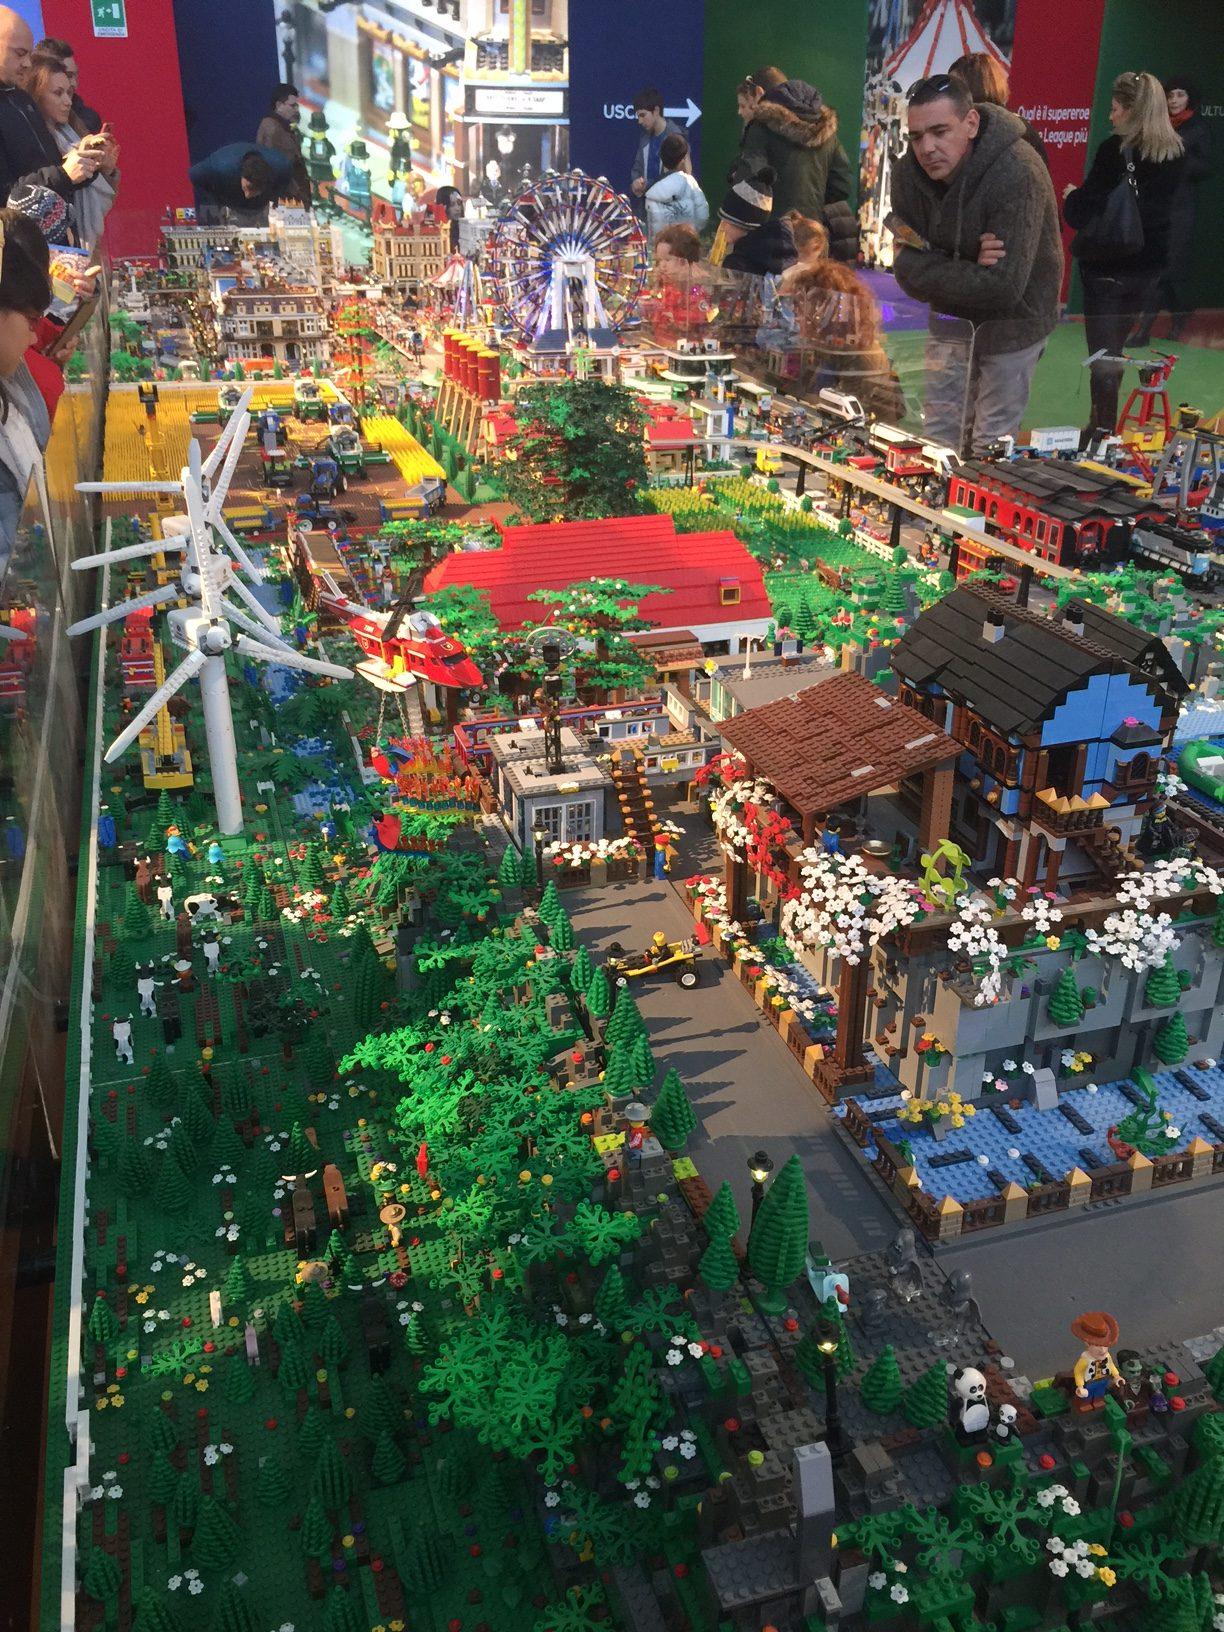 La mostra LegoCity con i bambini